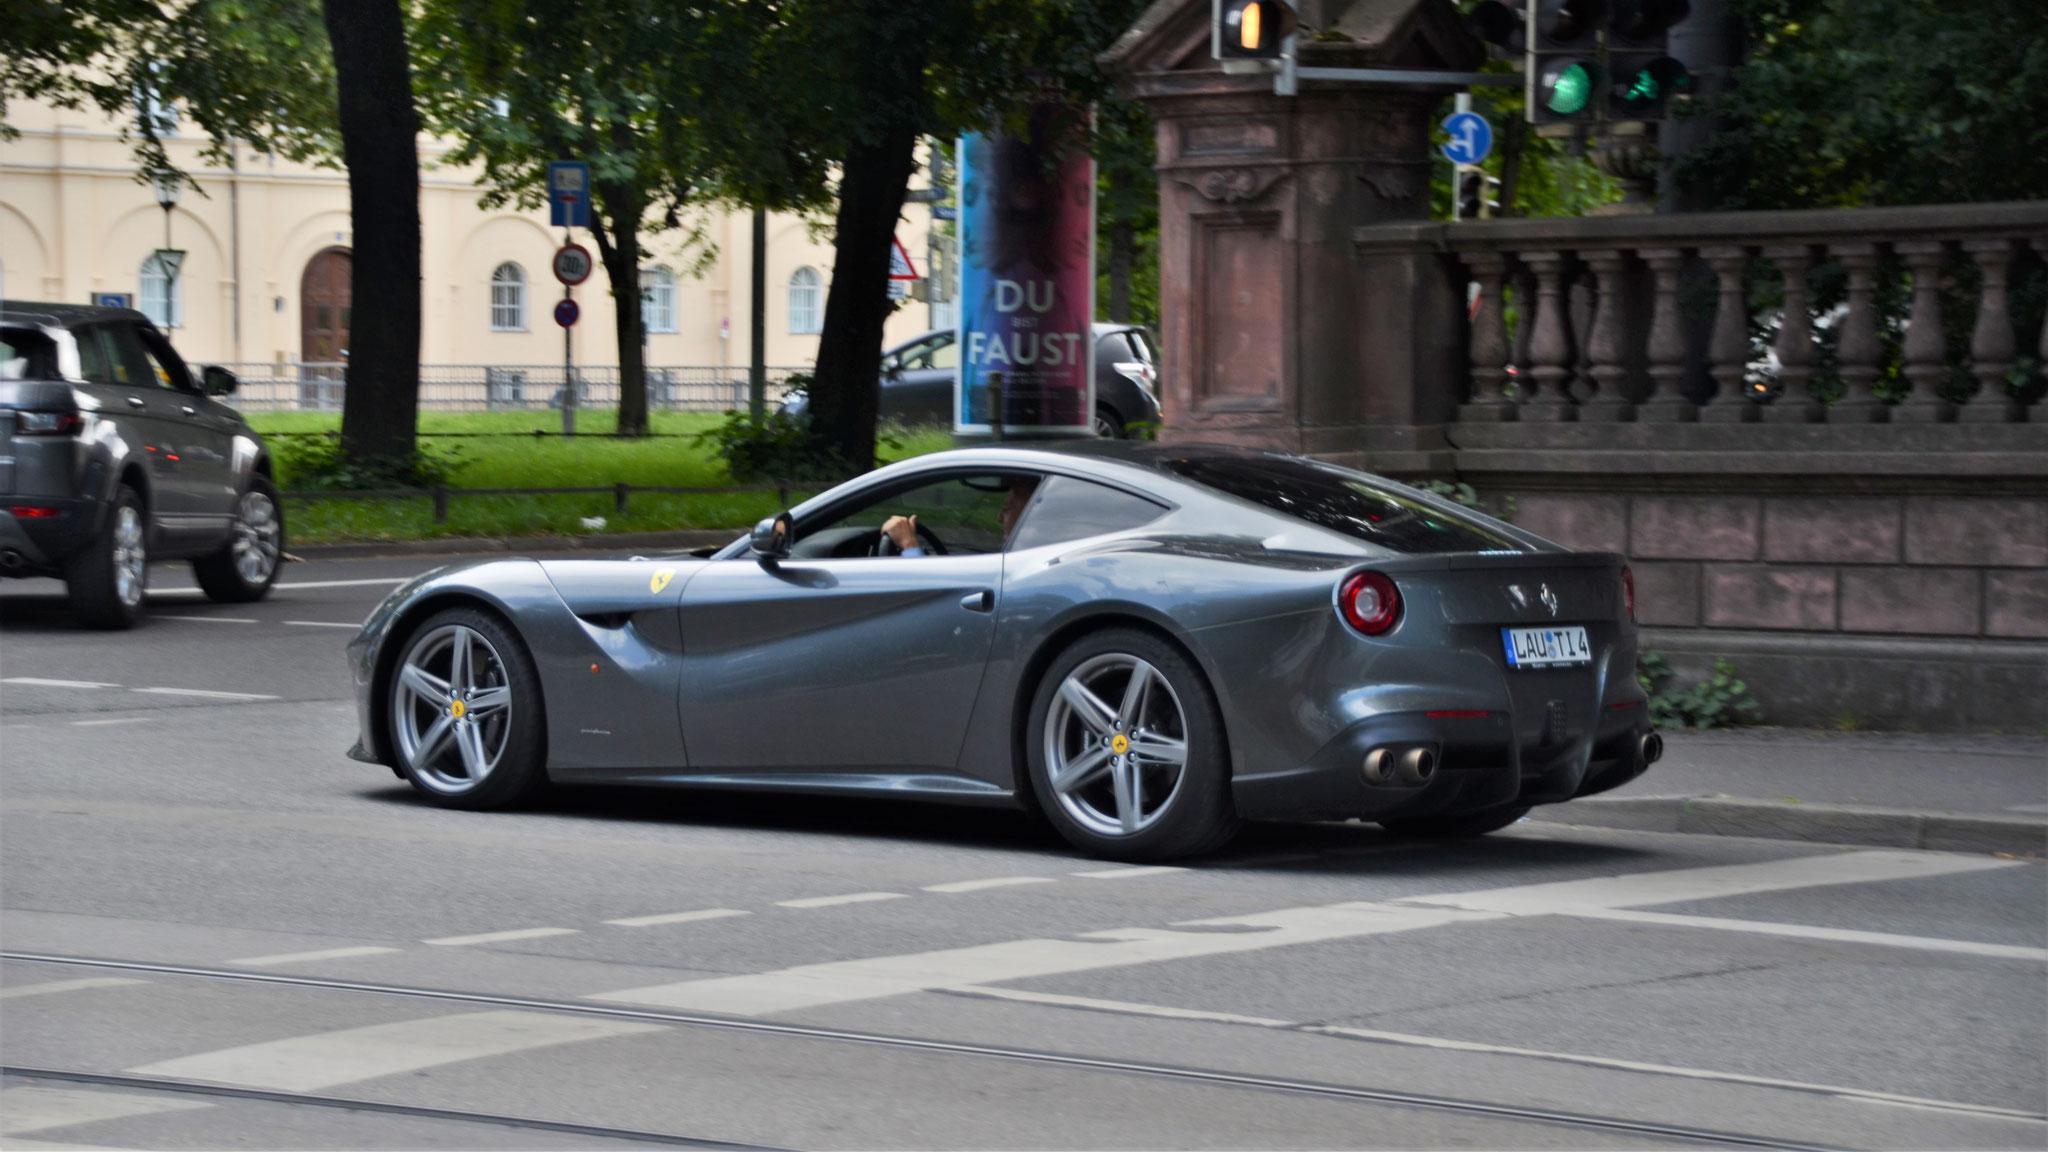 Ferrari F12 Berlinetta - LAU-TI-4